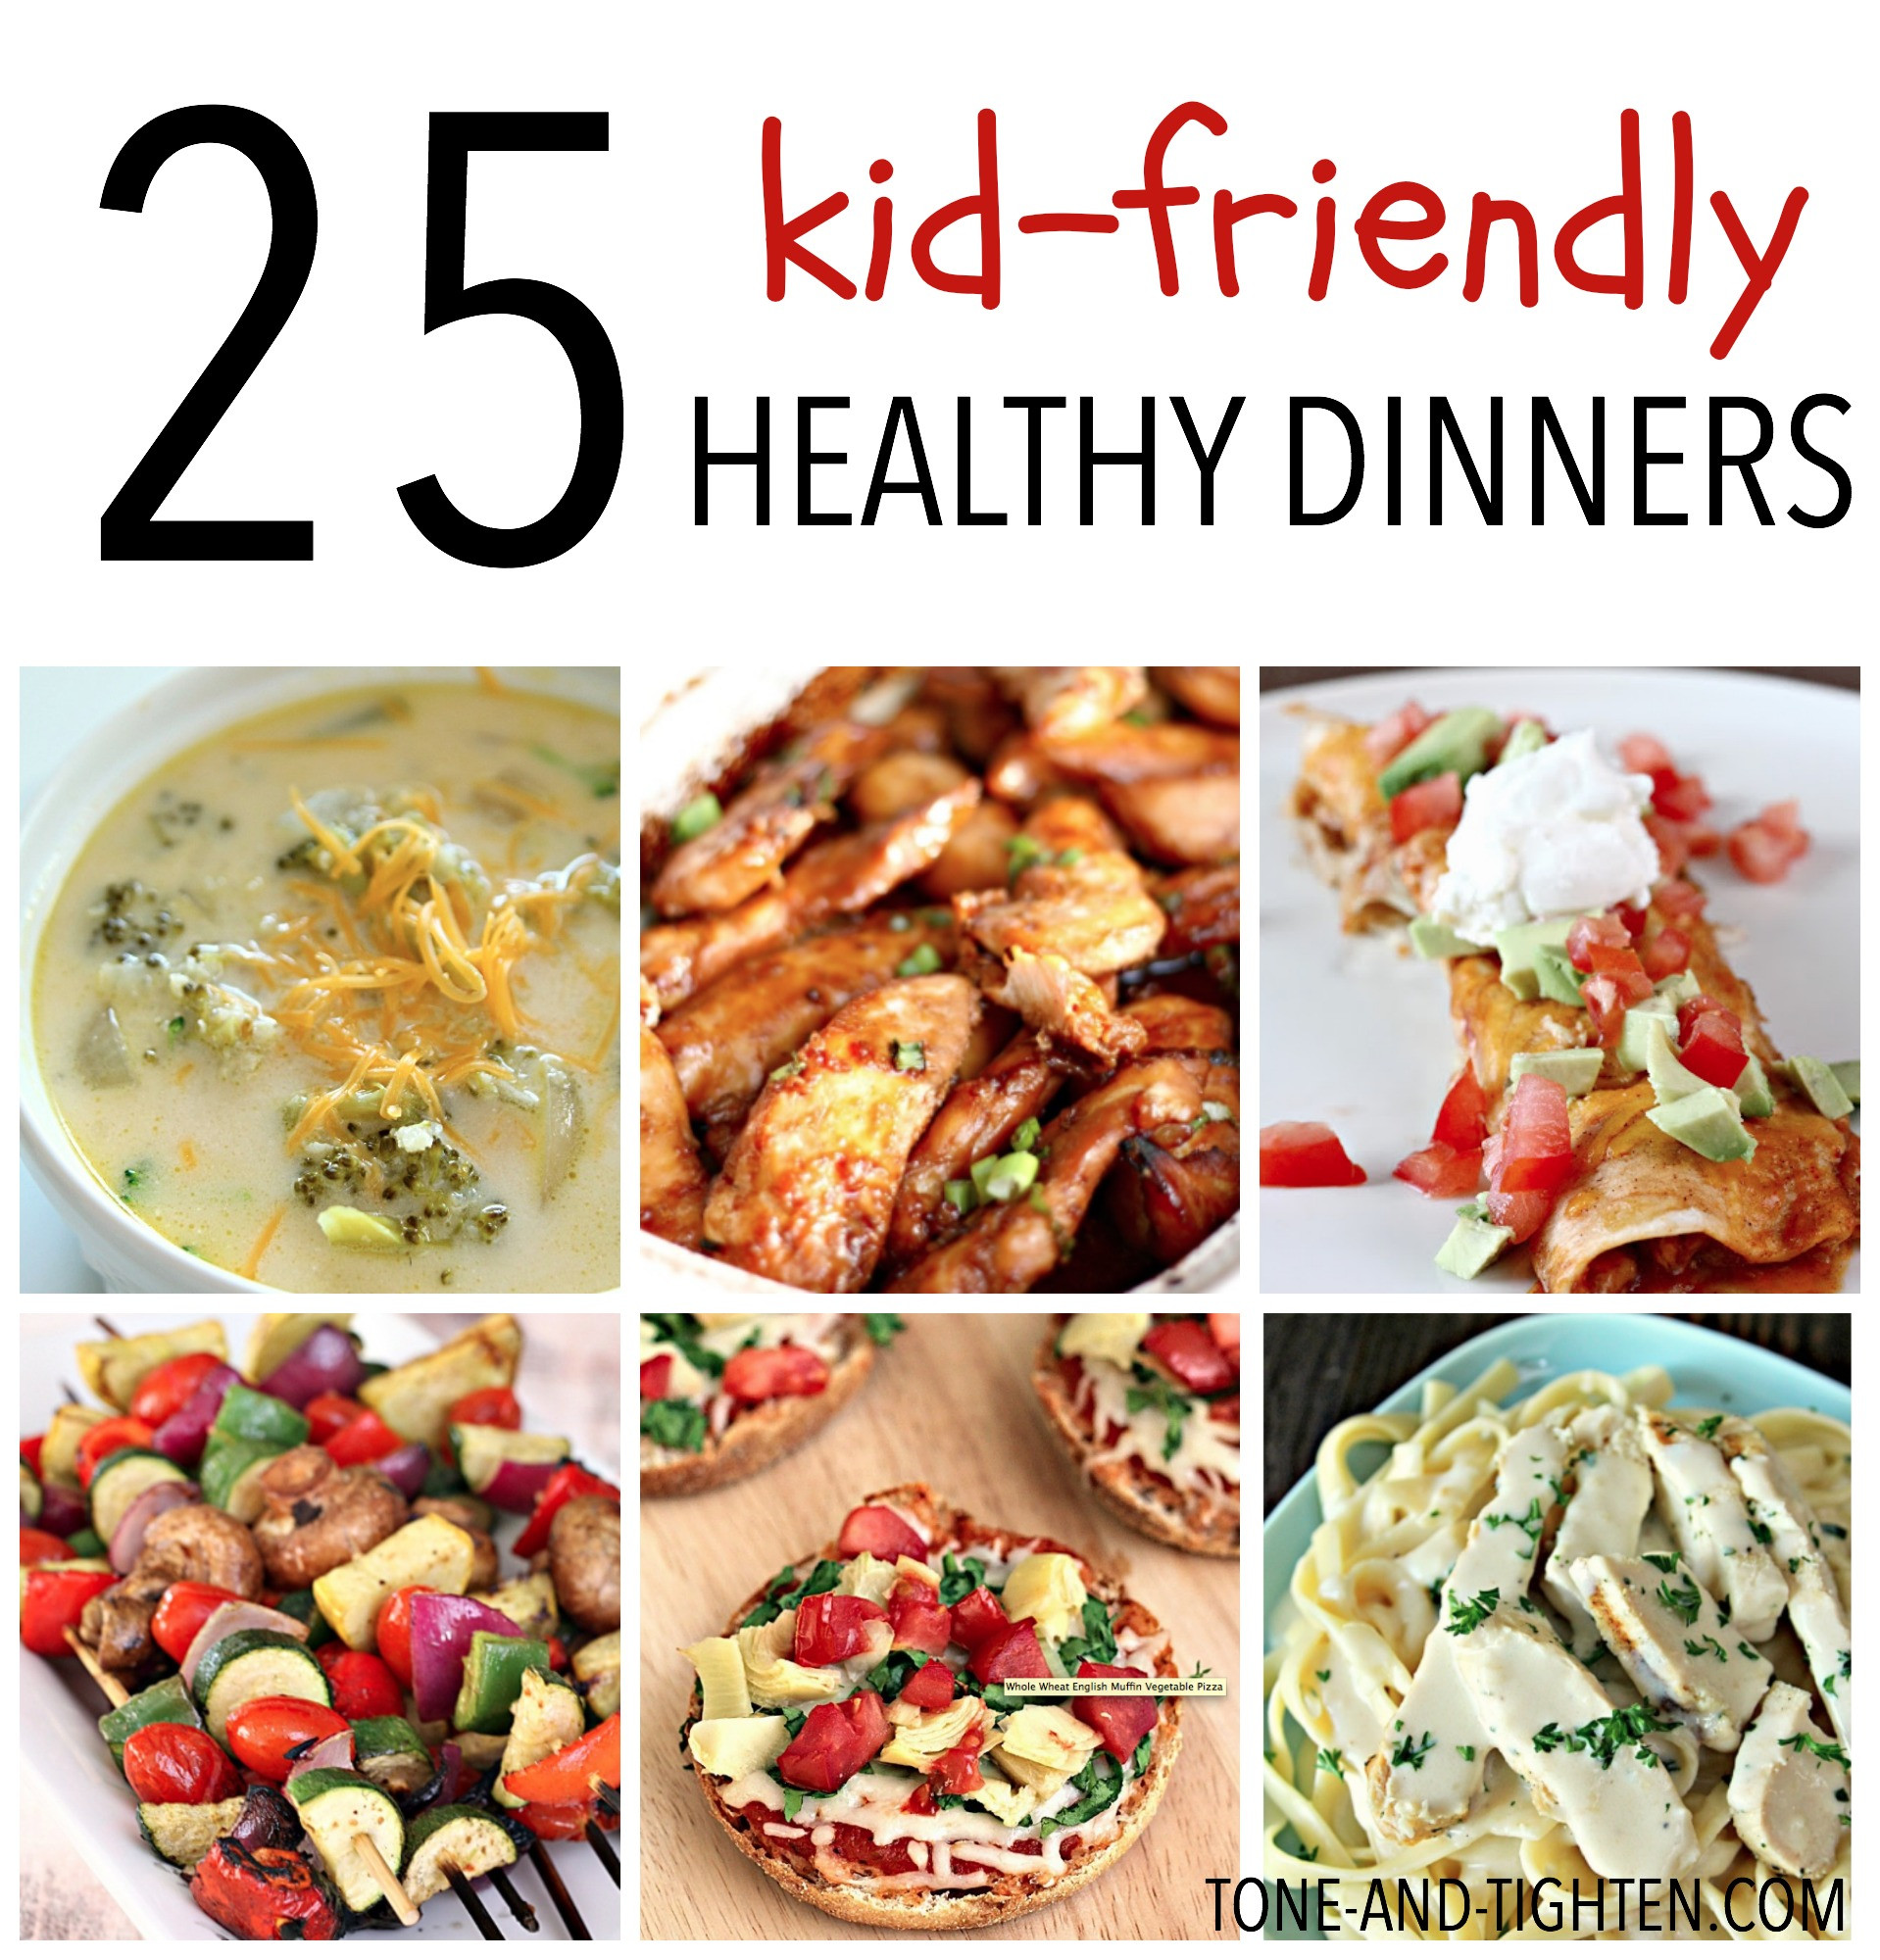 Kid Friendly Healthy Recipes  25 Kid Friendly Healthy Dinners